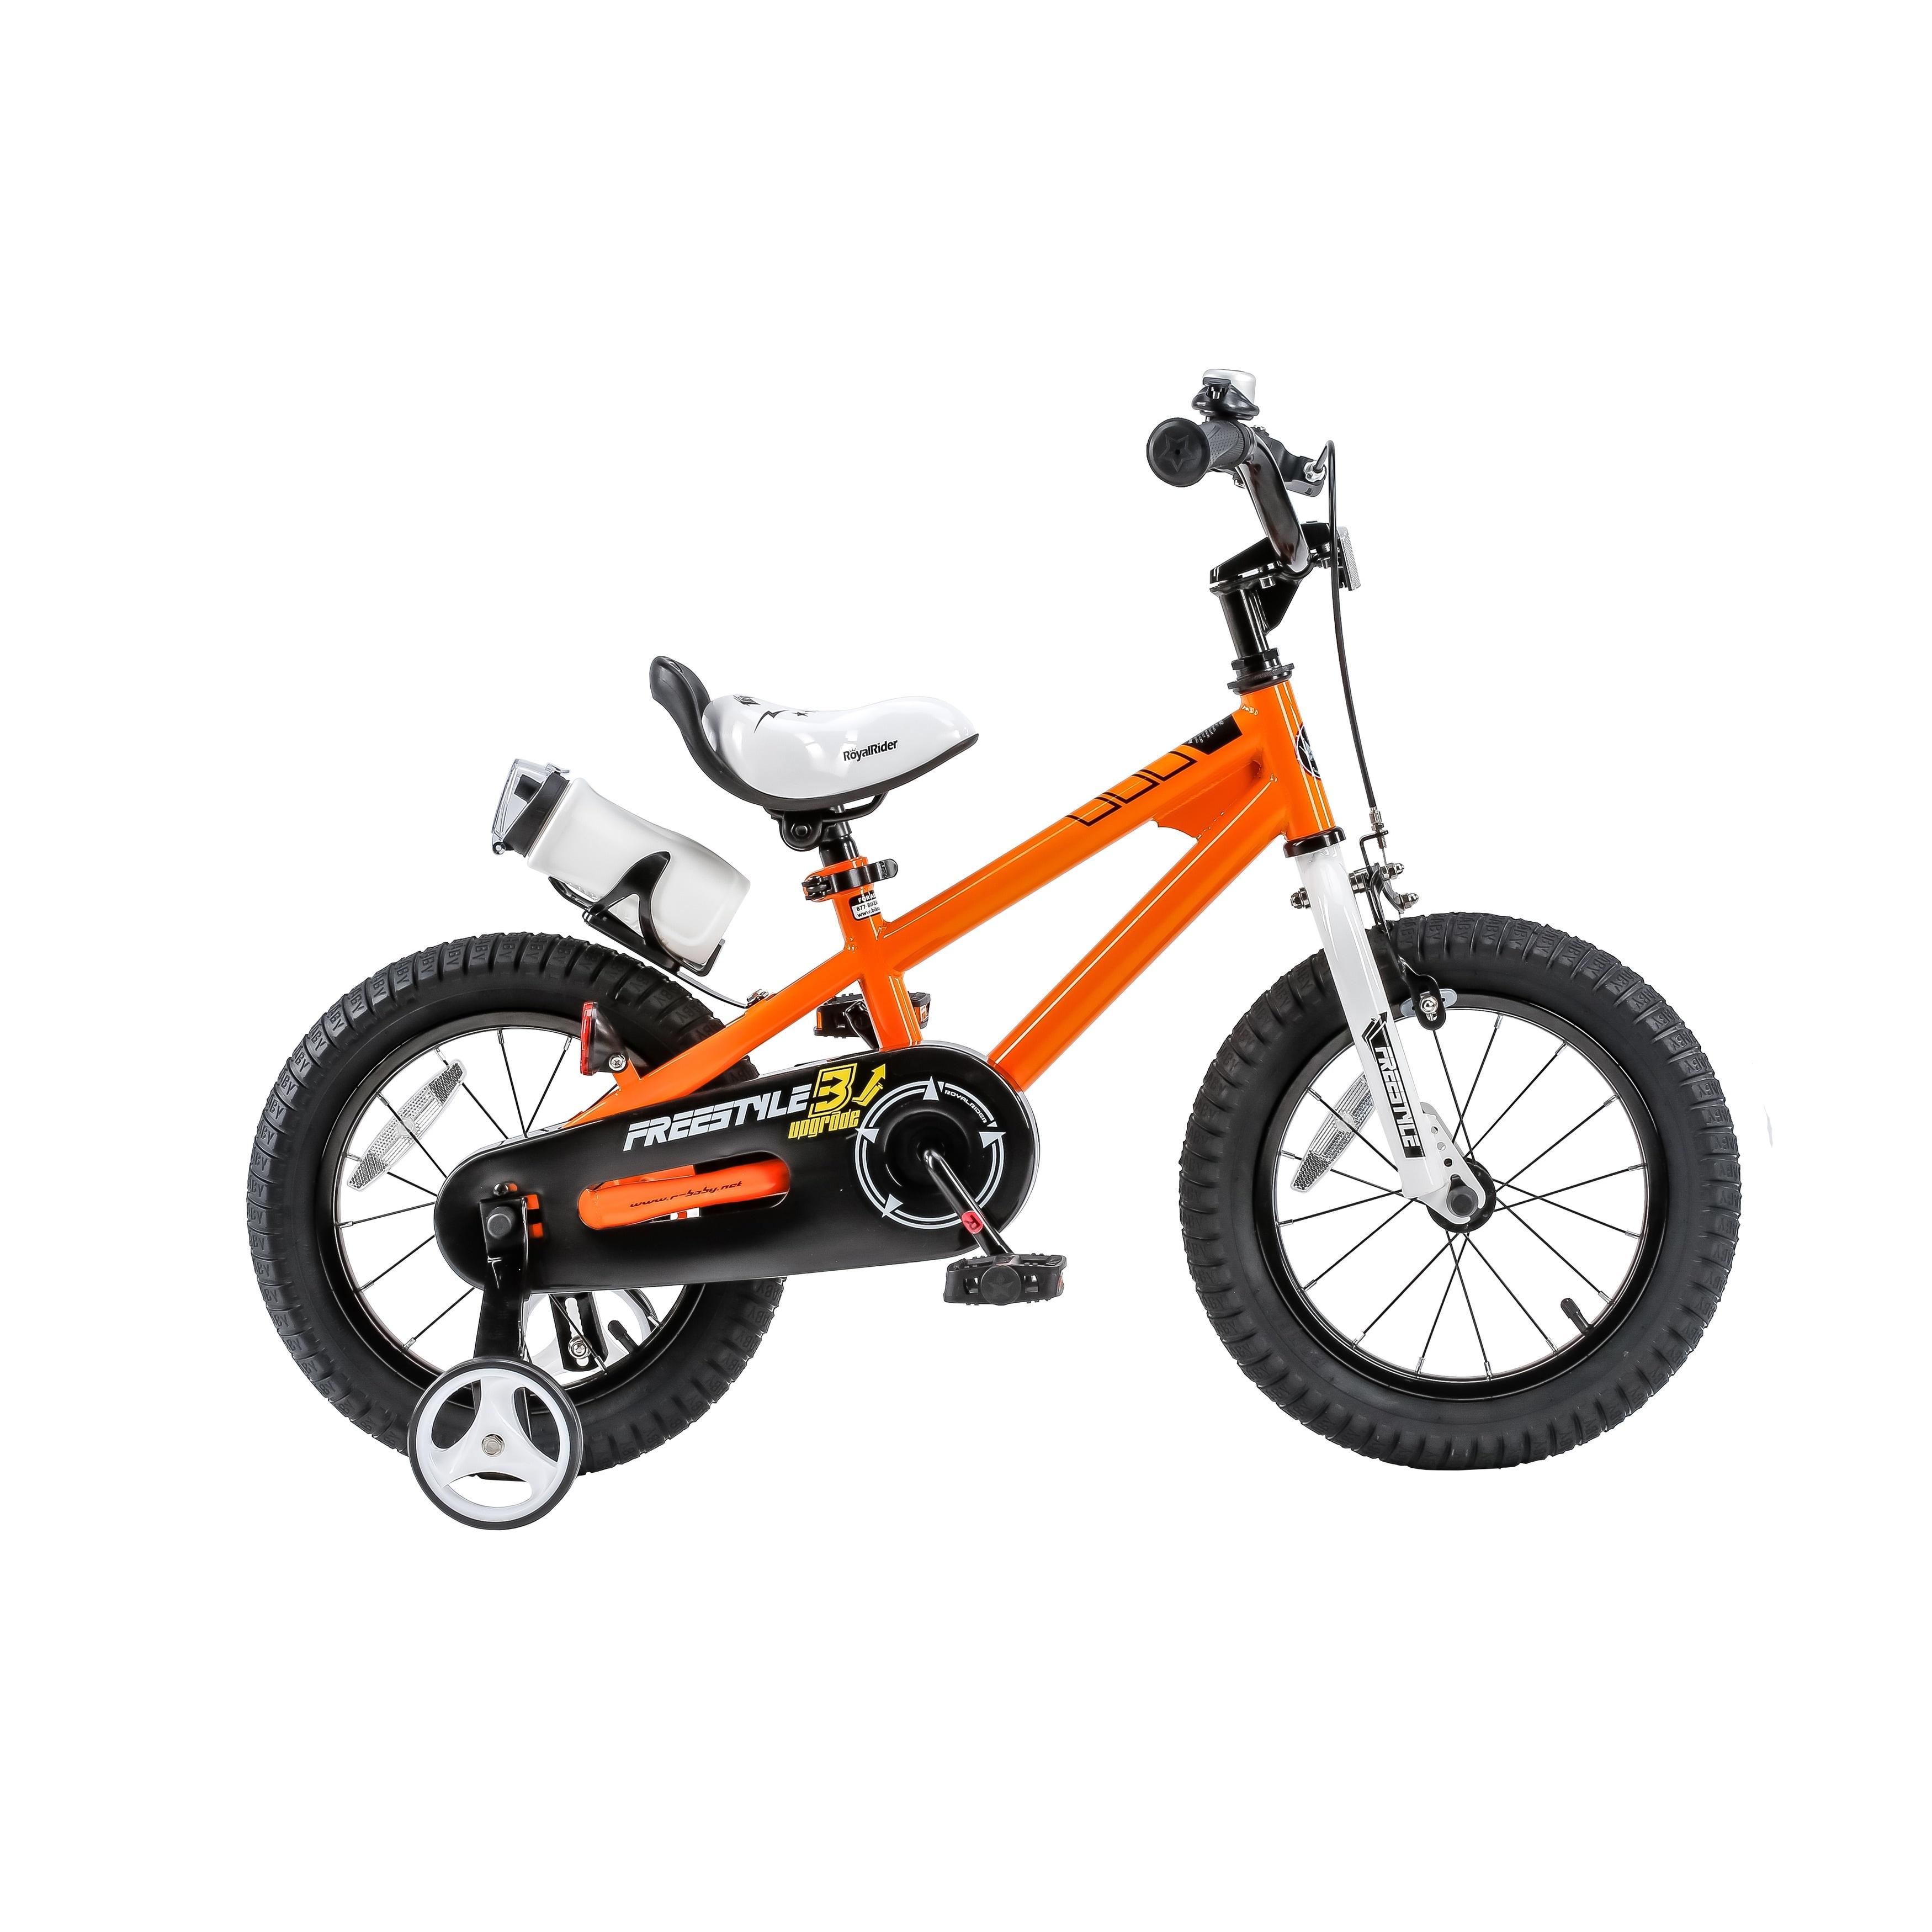 d2a3823c282 RoyalBaby Kids' Steel/Plastic 16-inch BMX Freestyle Bike with Training  Wheels